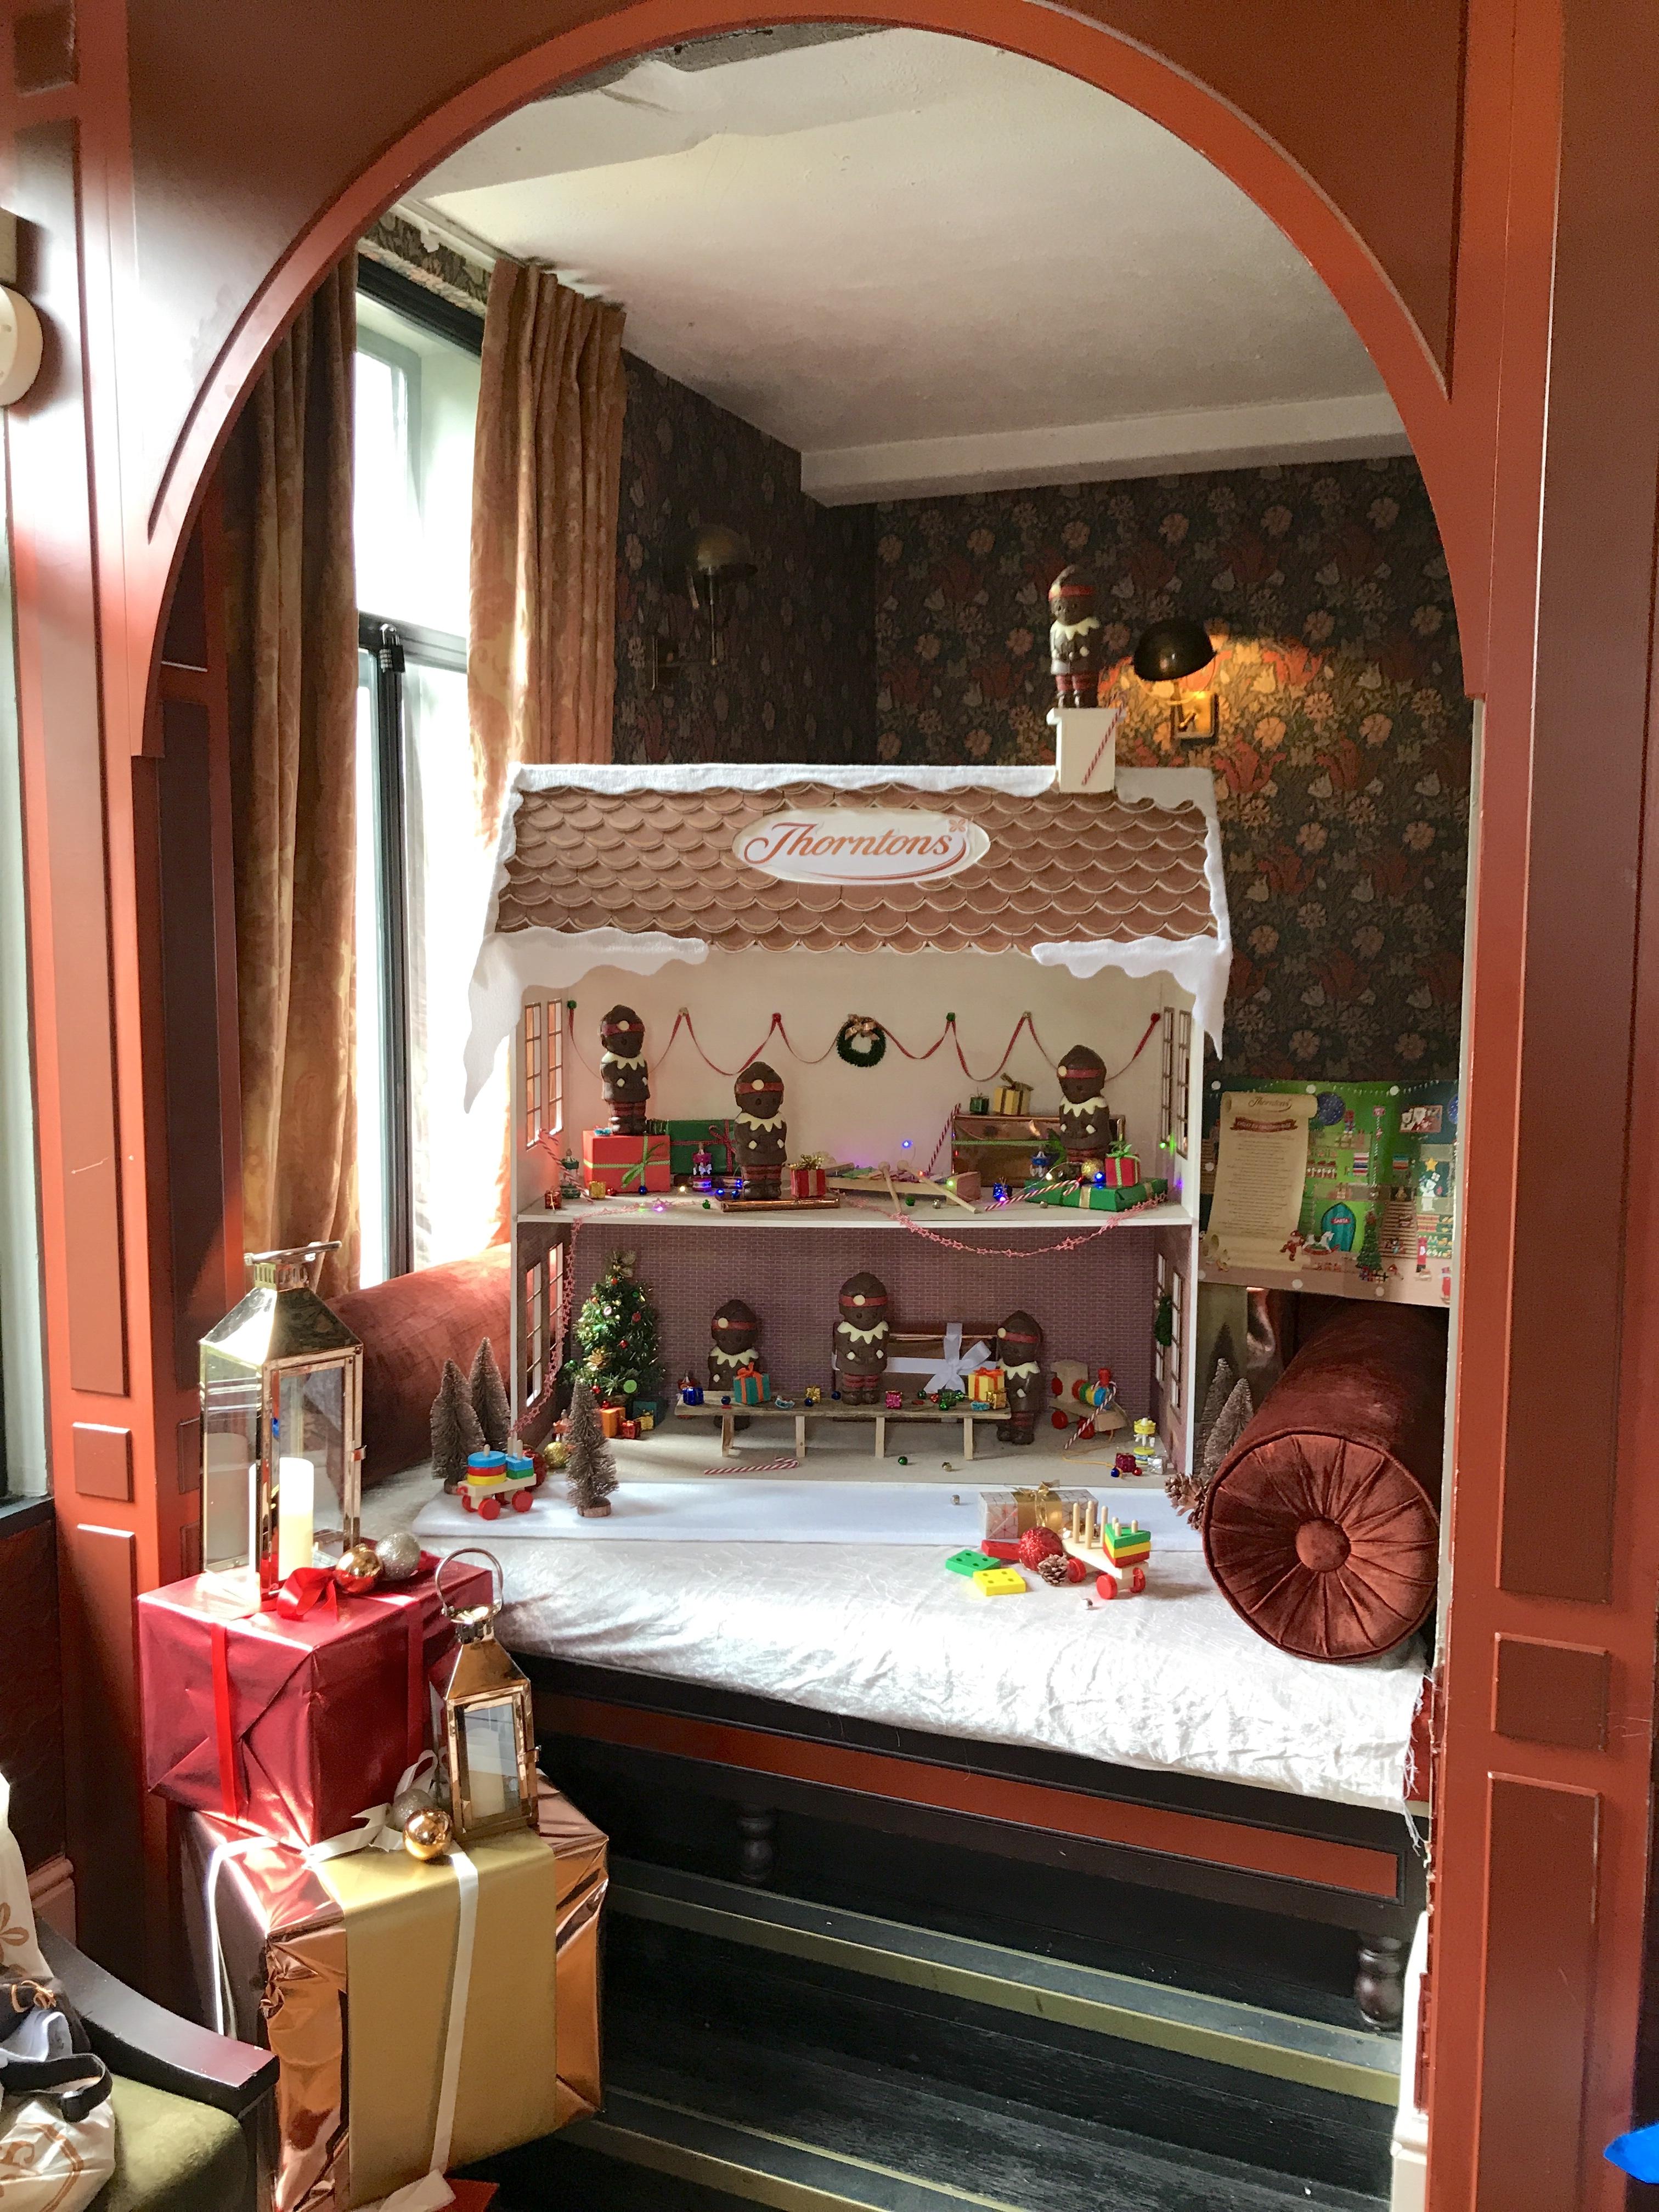 Thornton's Chocolates - Xmas In July